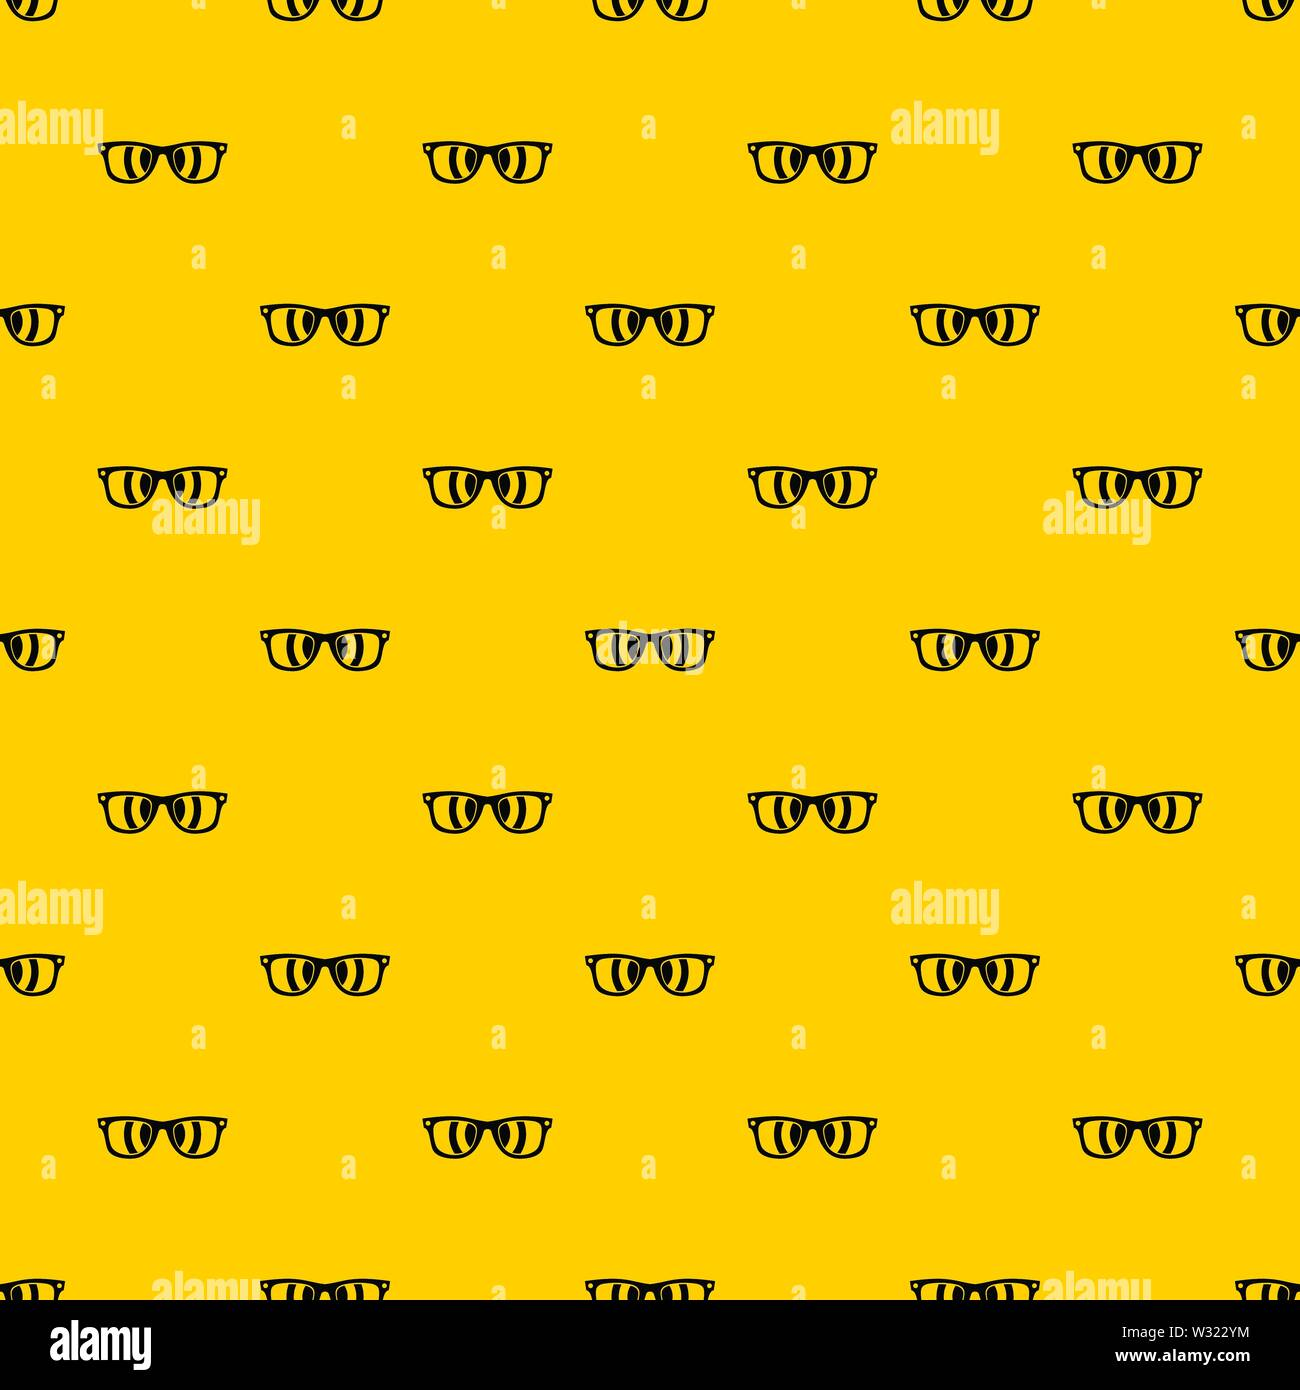 Sunglasses pattern vector - Stock Image